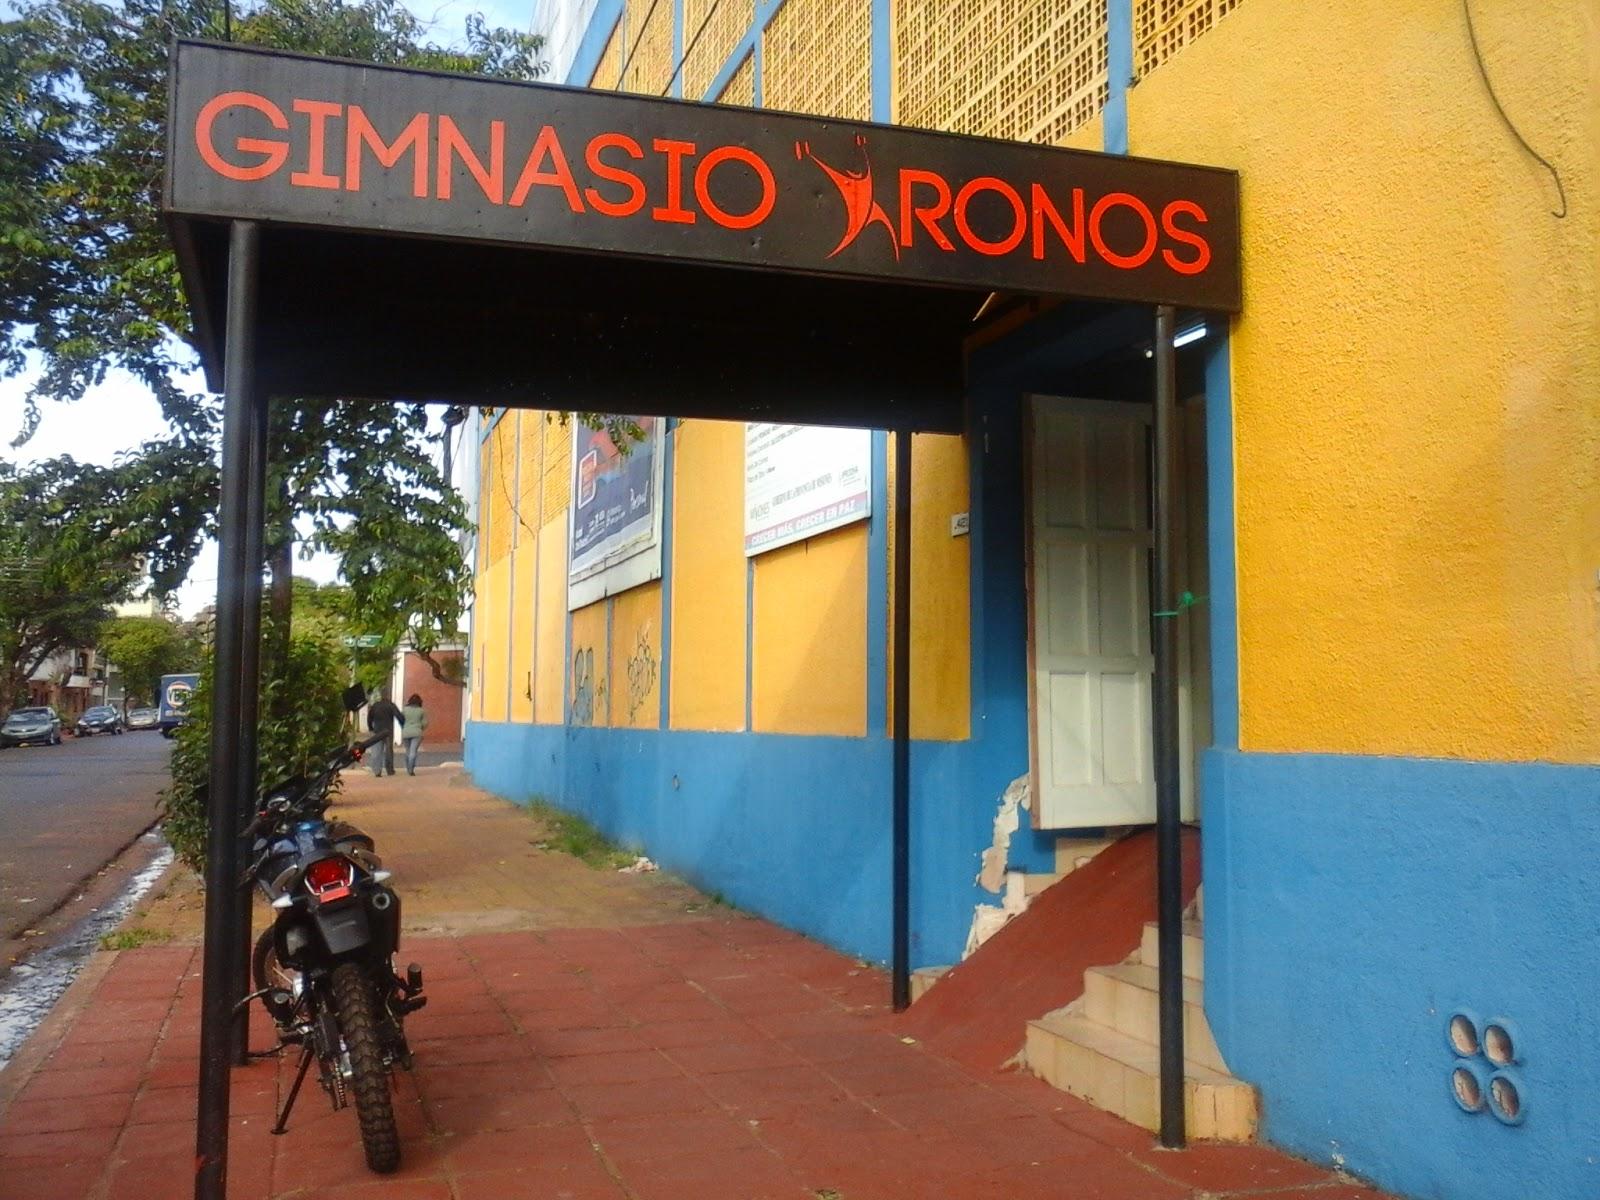 Salud y deporte posadas gimnasio kronos for Gimnasio kronos